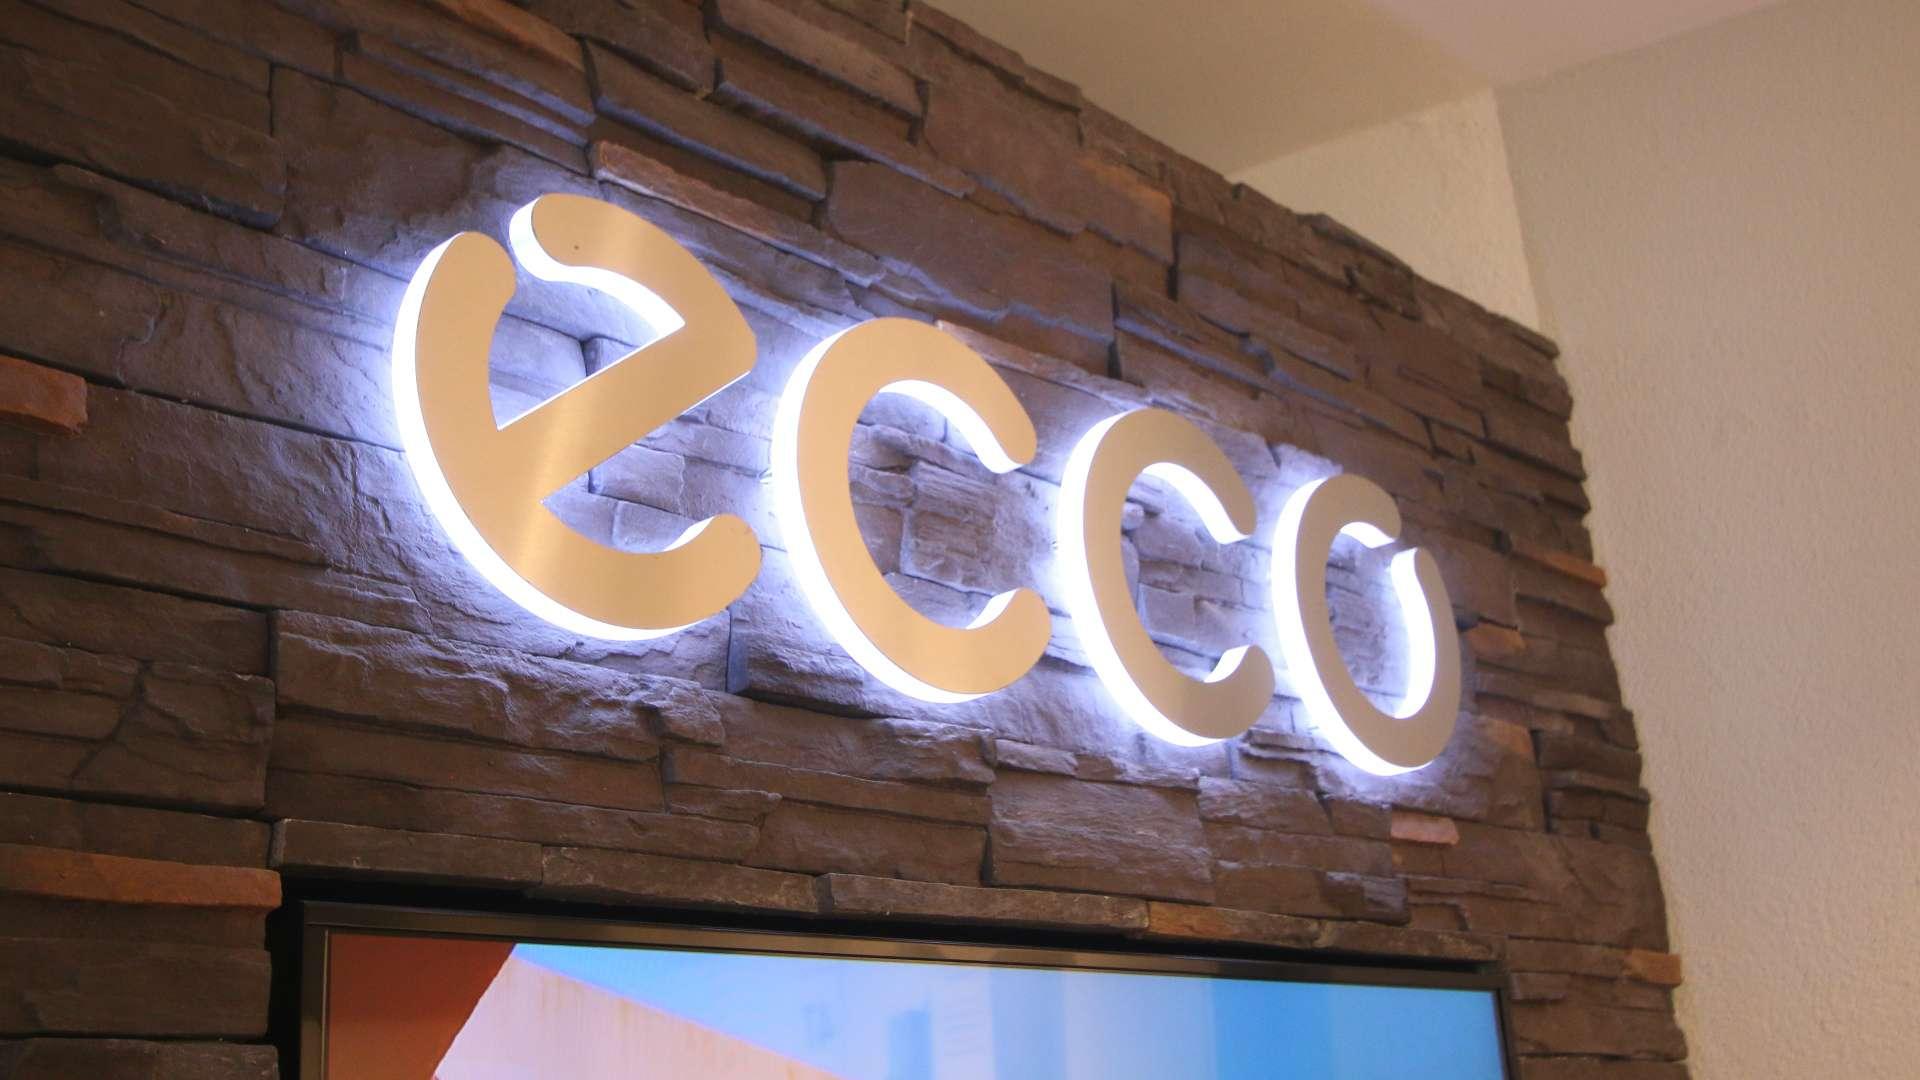 beleuchtetes Ecco-Schild